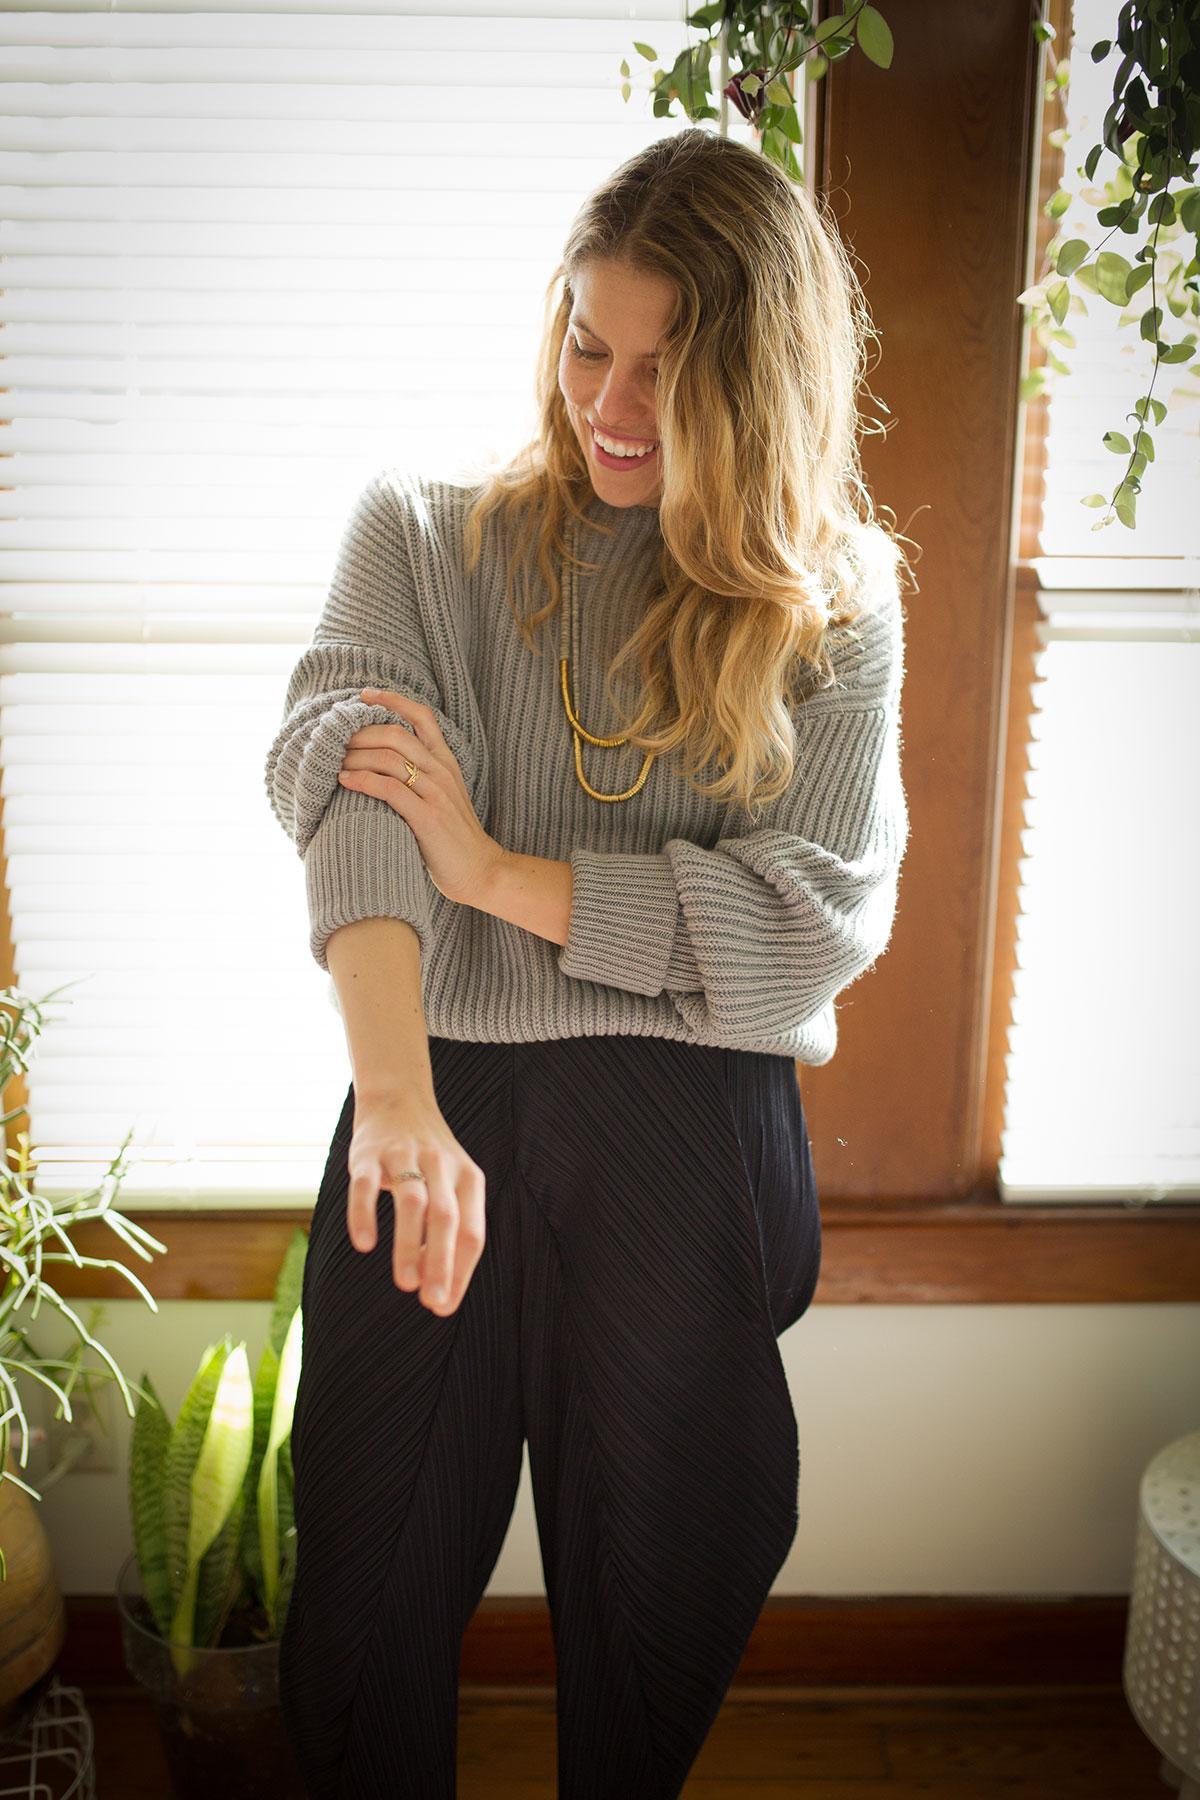 Christy Curcuru, Owner